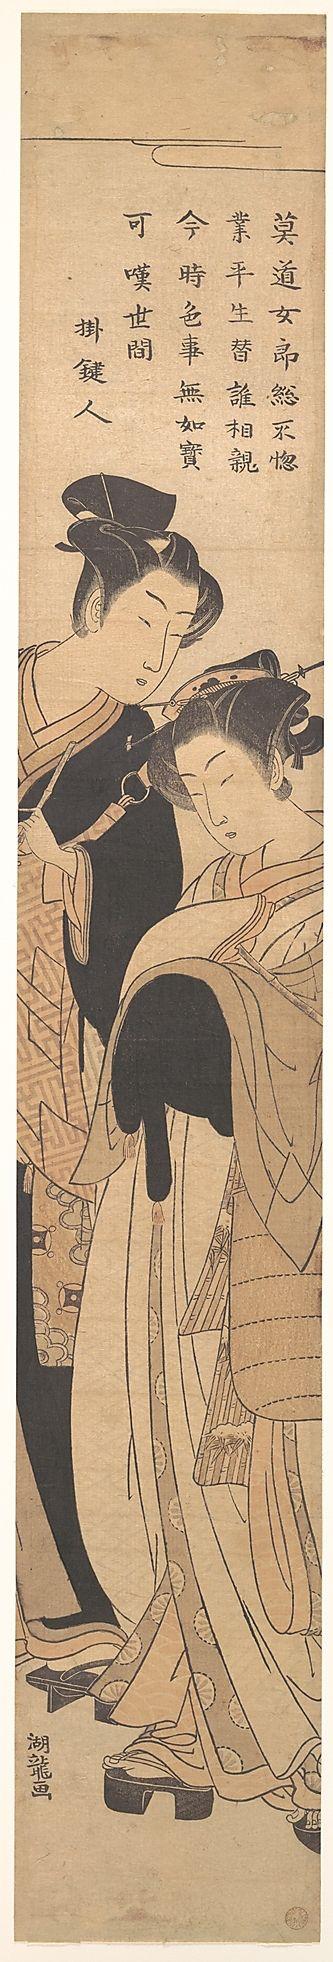 Isoda Koryūsai (Japanese, 1735–1790). Lovers, 1770. Edo period (1615-1868). Japan. The Metropolitan Museum of Art, New York. Rogers Fund, 1922 (JP1291)